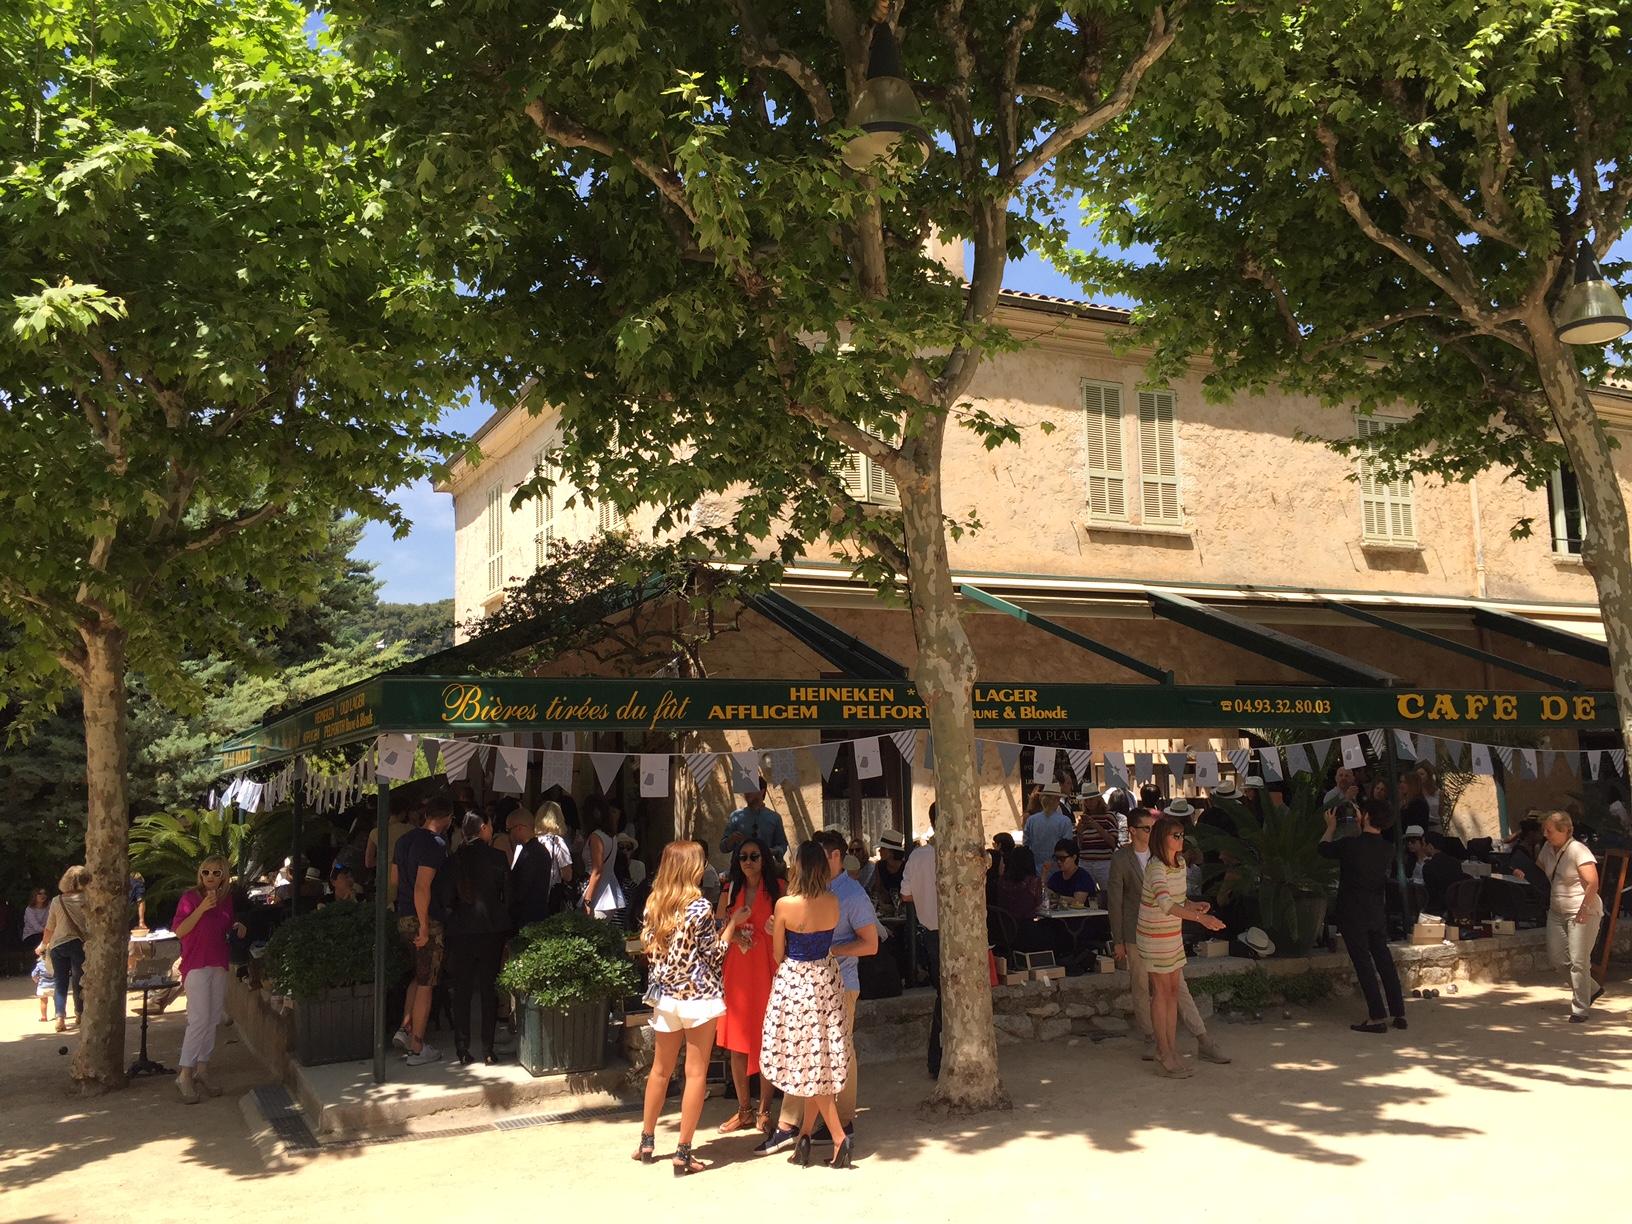 French riviera itinerary - Saint Paul de Vence